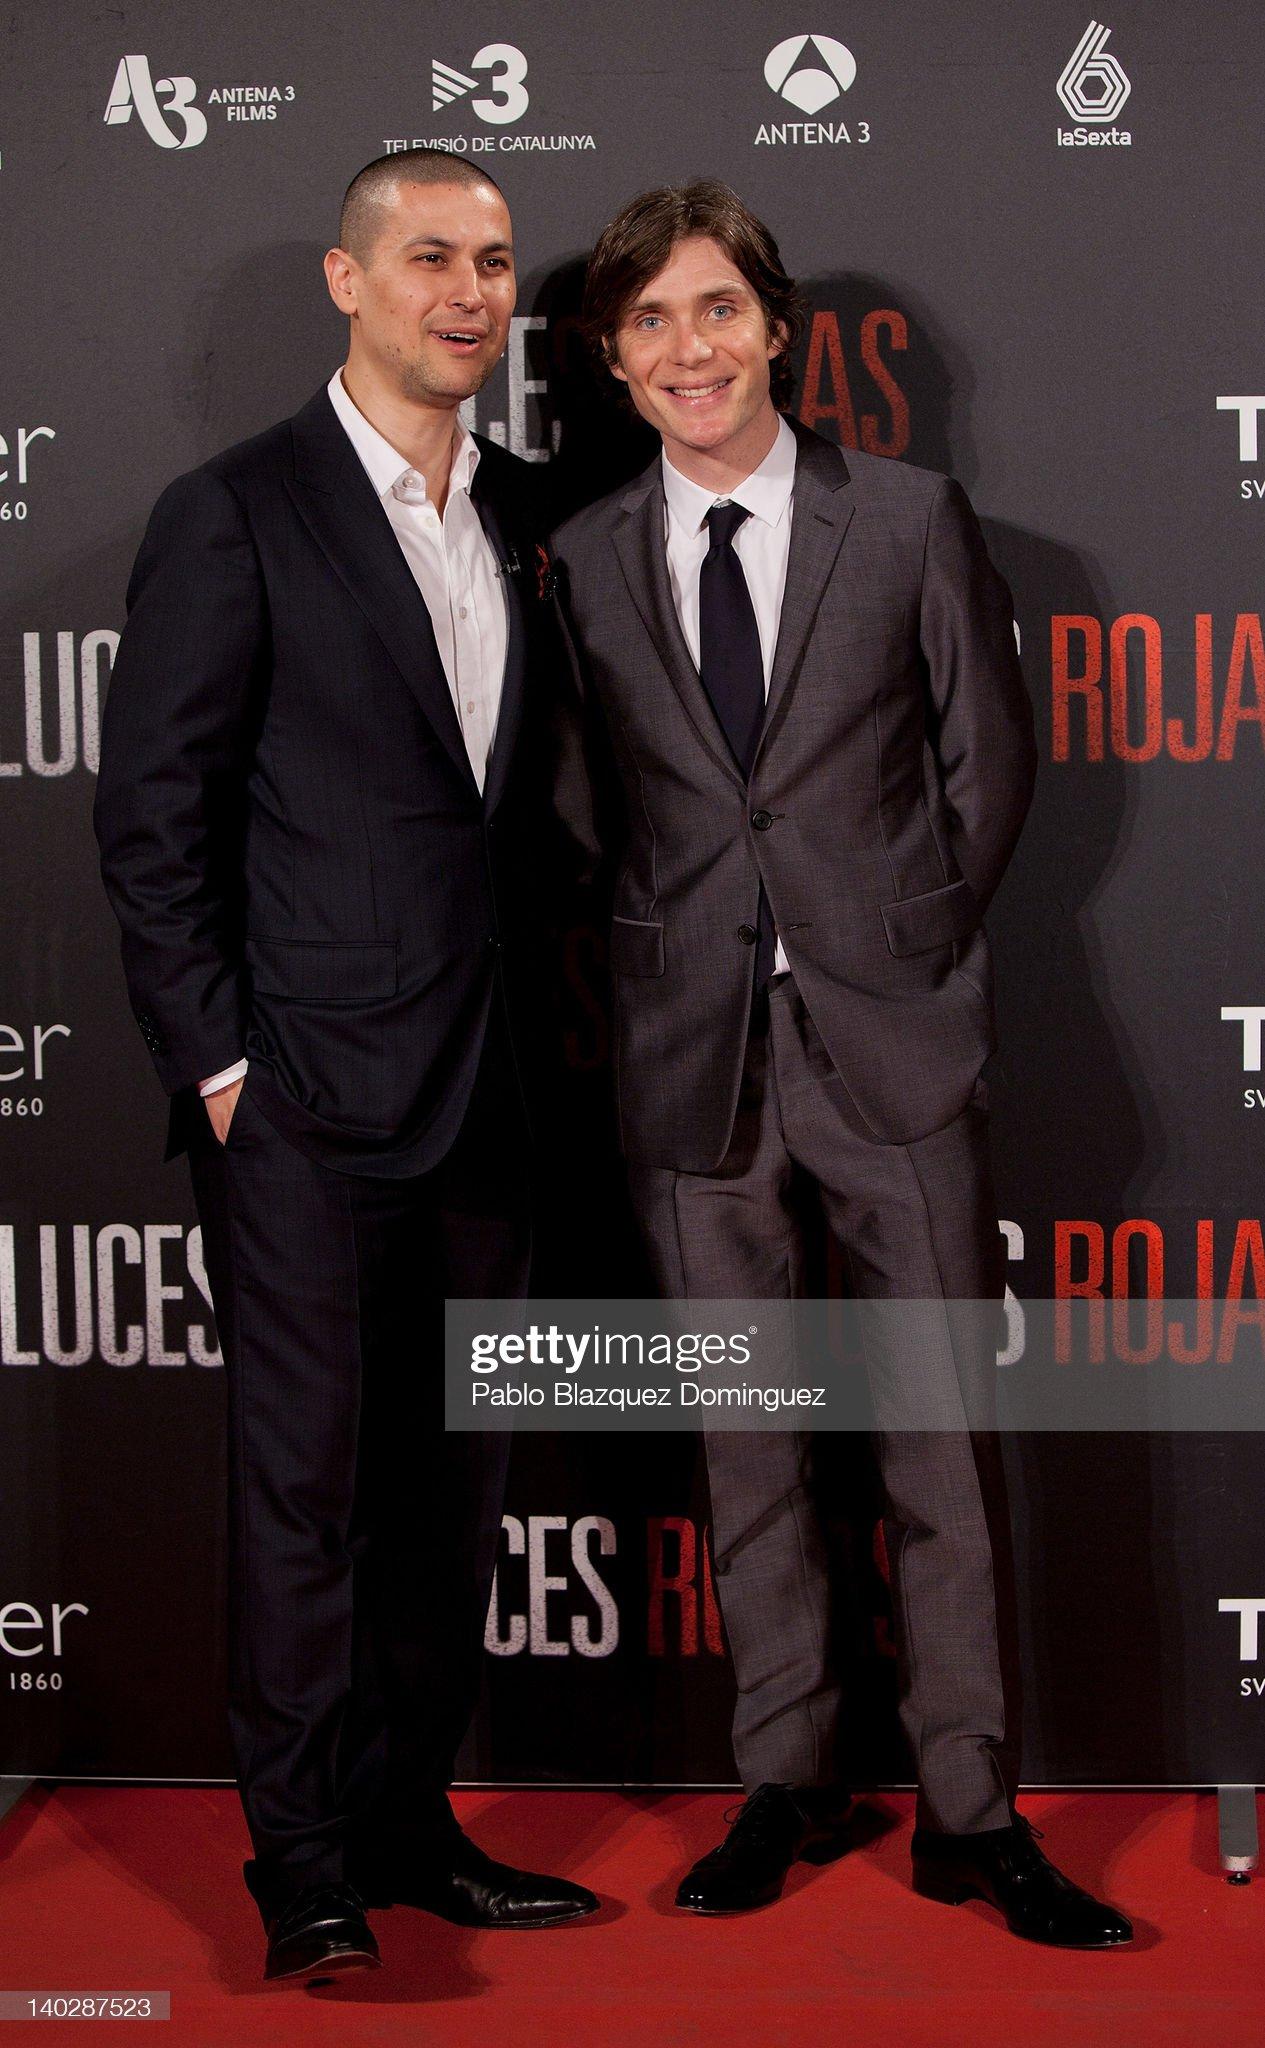 ¿Cuánto mide Rodrigo Cortés? - Altura Director-rodrigo-cortes-and-actor-cillian-murphy-attend-the-red-at-picture-id140287523?s=2048x2048